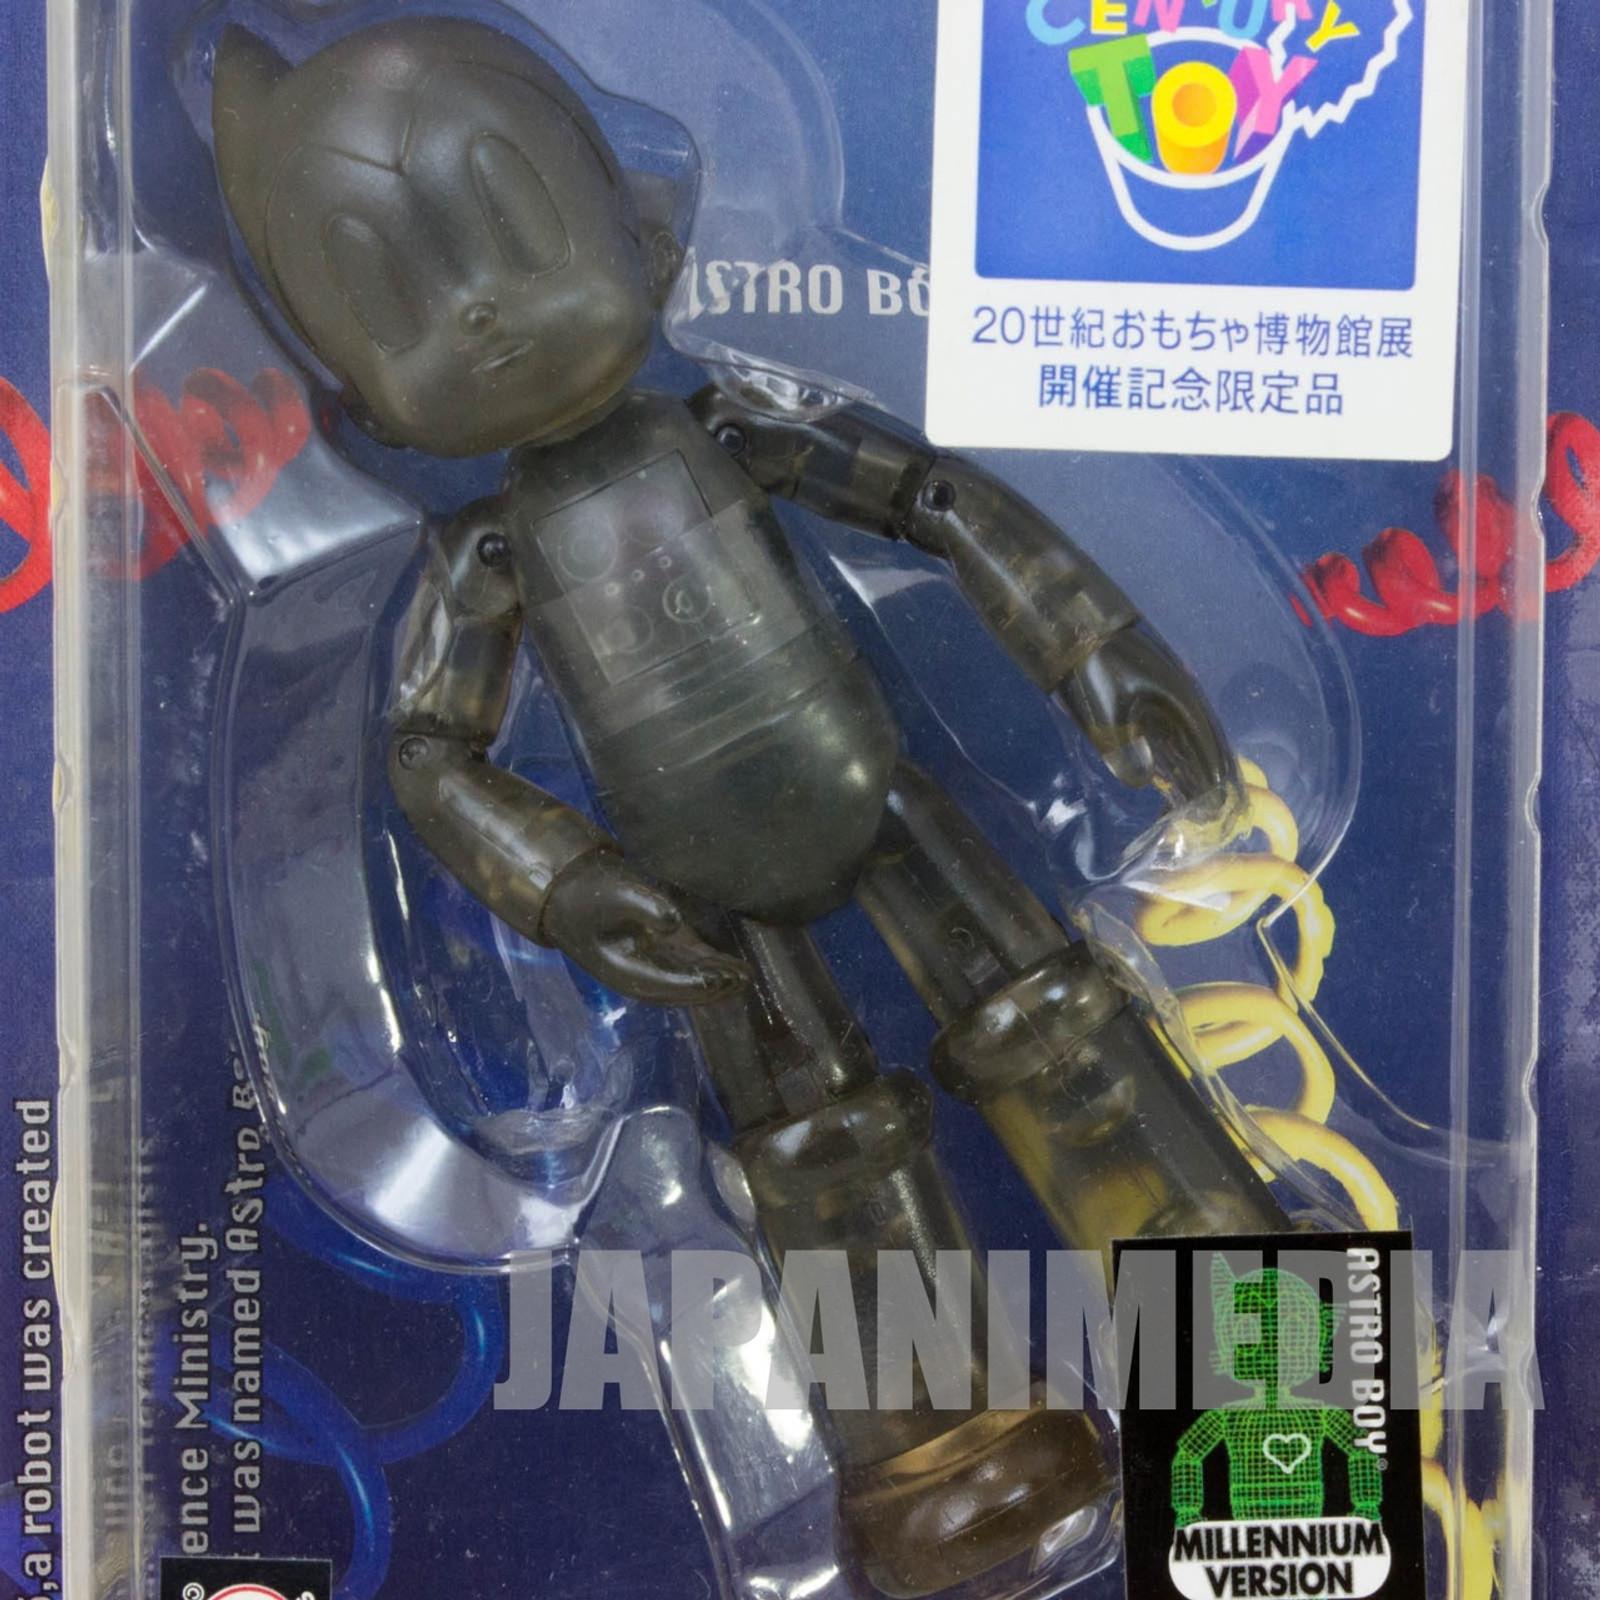 Mighty Atom Astro Boy Miracle Action Figure Millennium ver. Medicom Toy JAPAN